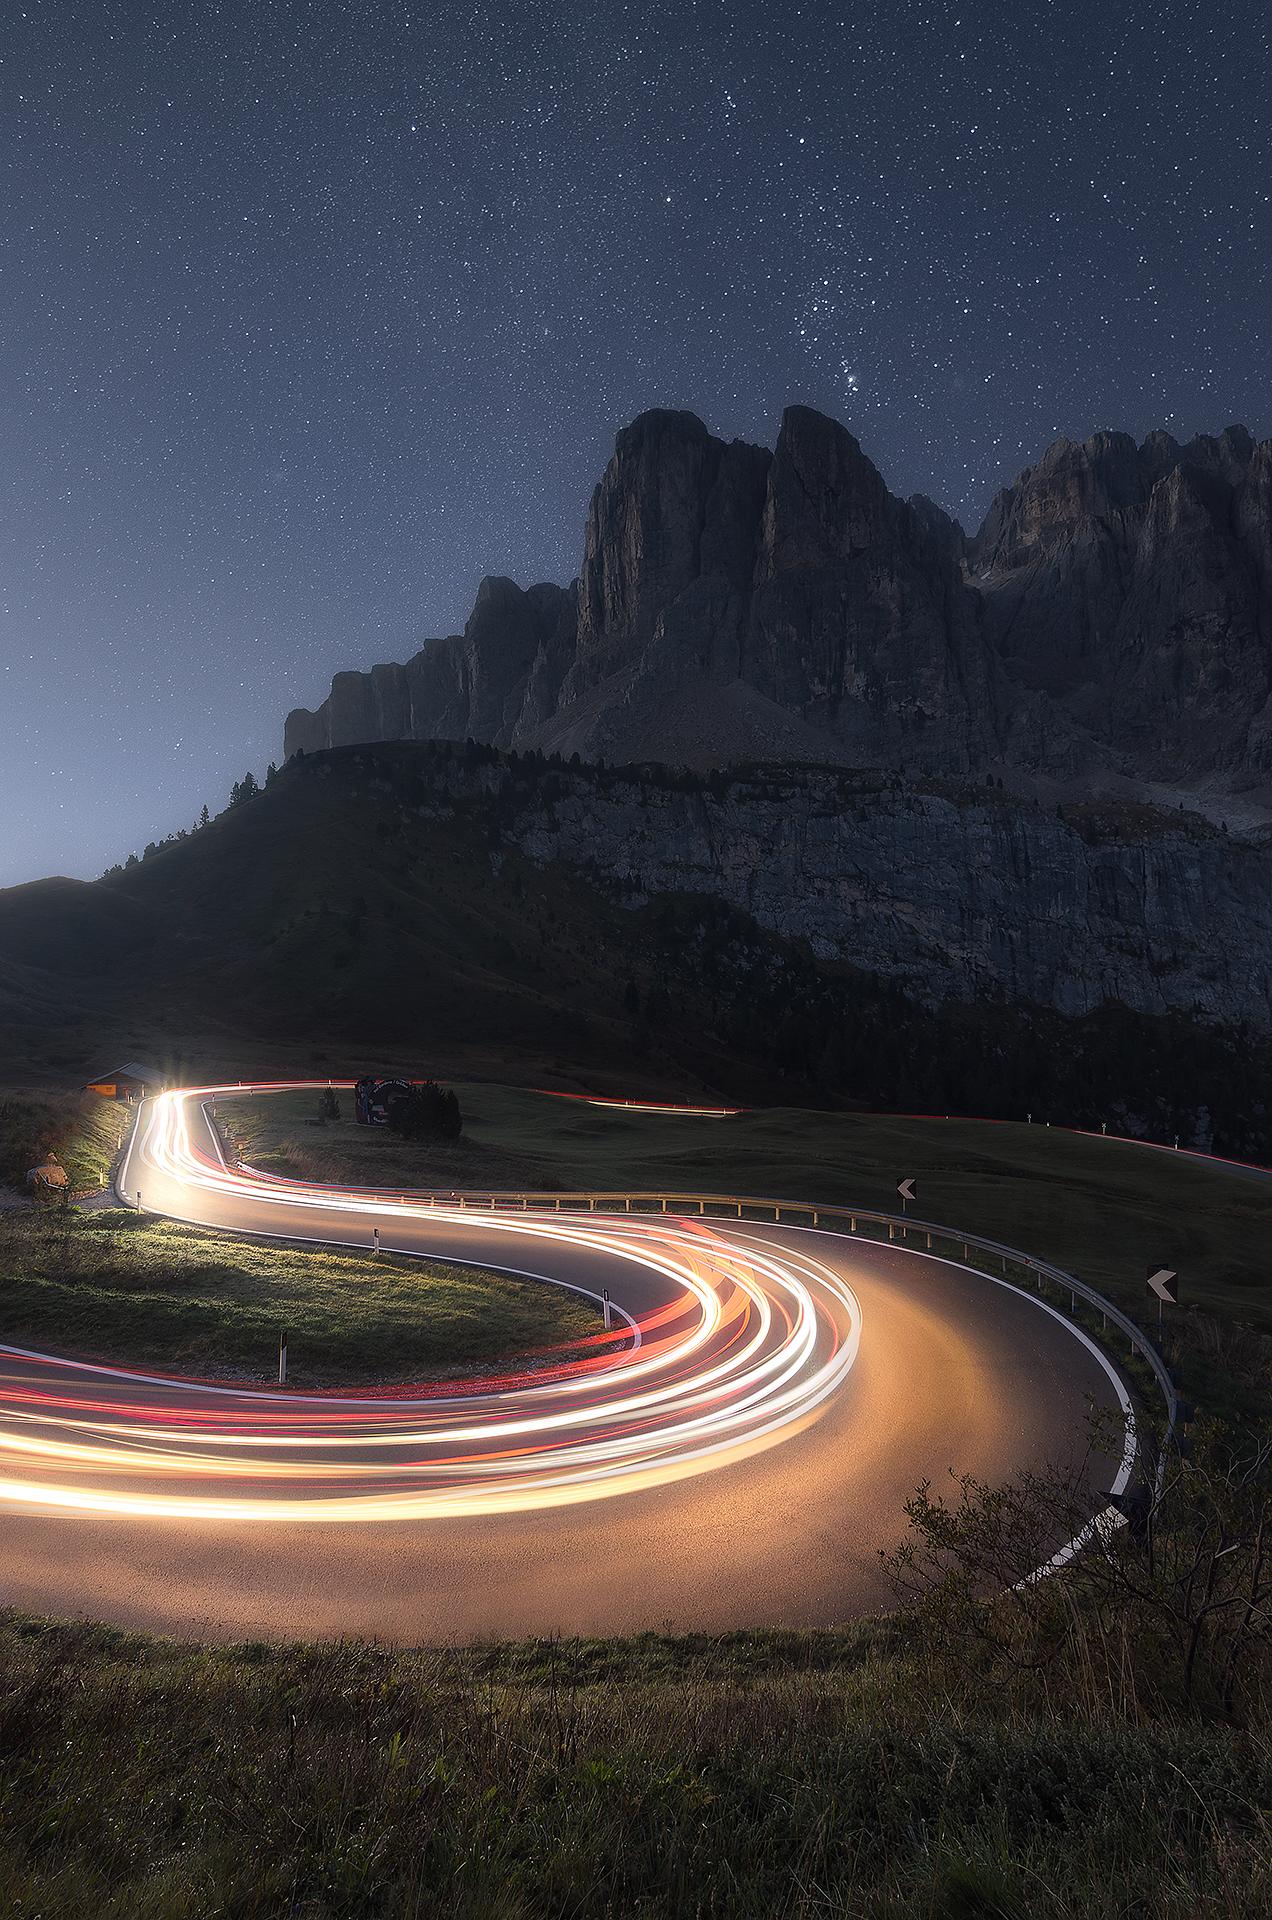 The speed of light...